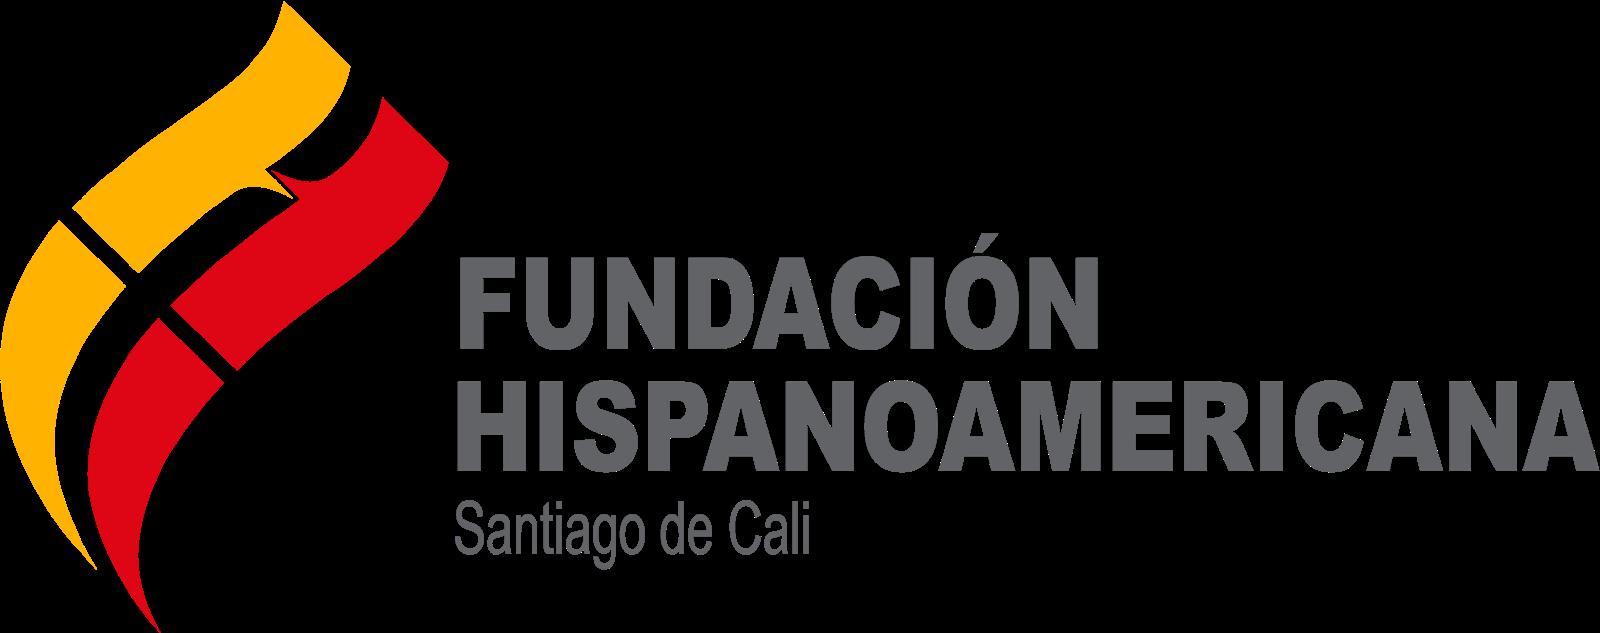 FUNDACION HISPANOAMERICANA SANTIAGO DE CALI